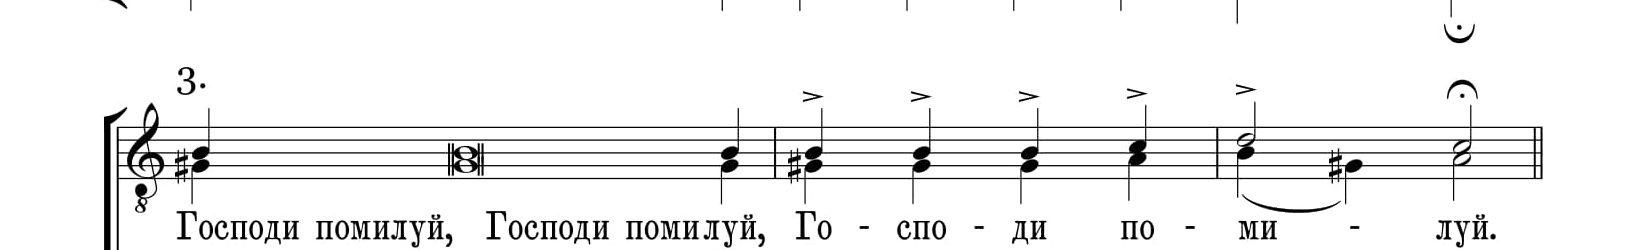 Сугубая ектения муз. иер. Нафанаила